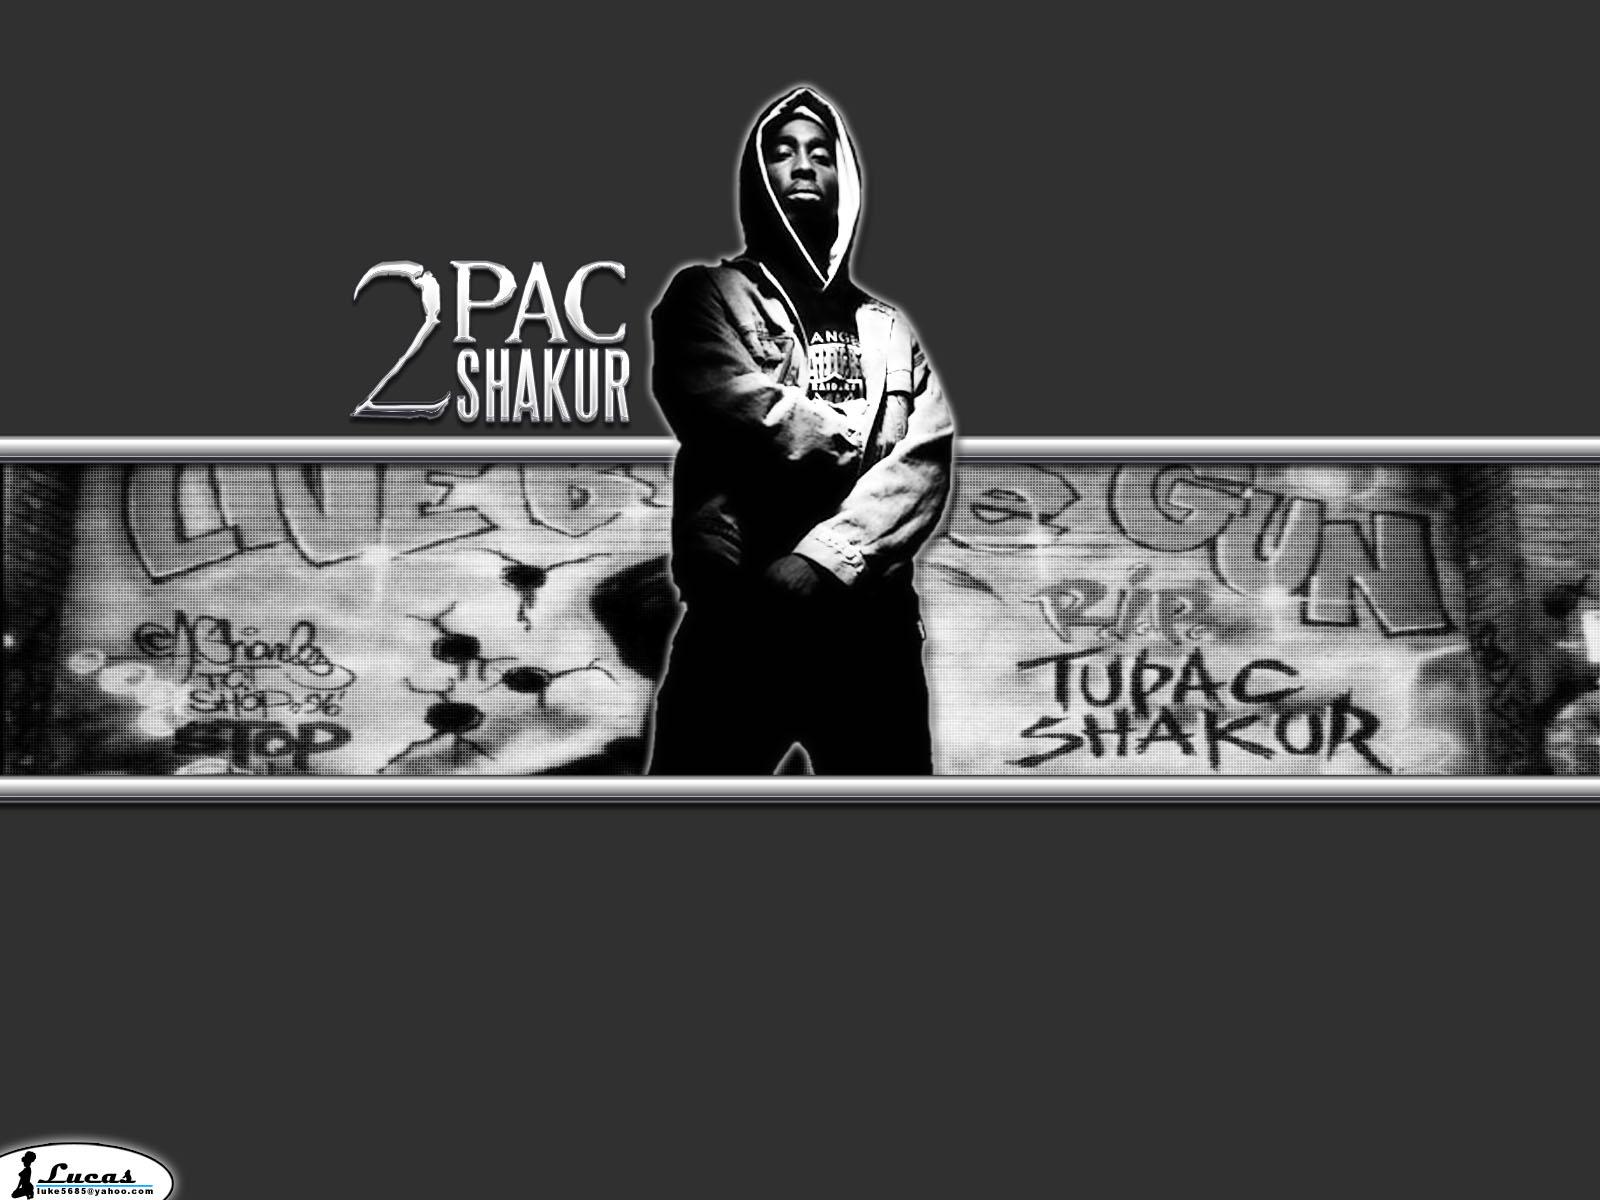 http://3.bp.blogspot.com/-rC1ThXmQhe8/T5PT0Rl3T3I/AAAAAAAADcE/ffdV4egyXvE/s1600/2pac+-+tupac+shakur+-+hd+gangsta+wallpapers.jpg